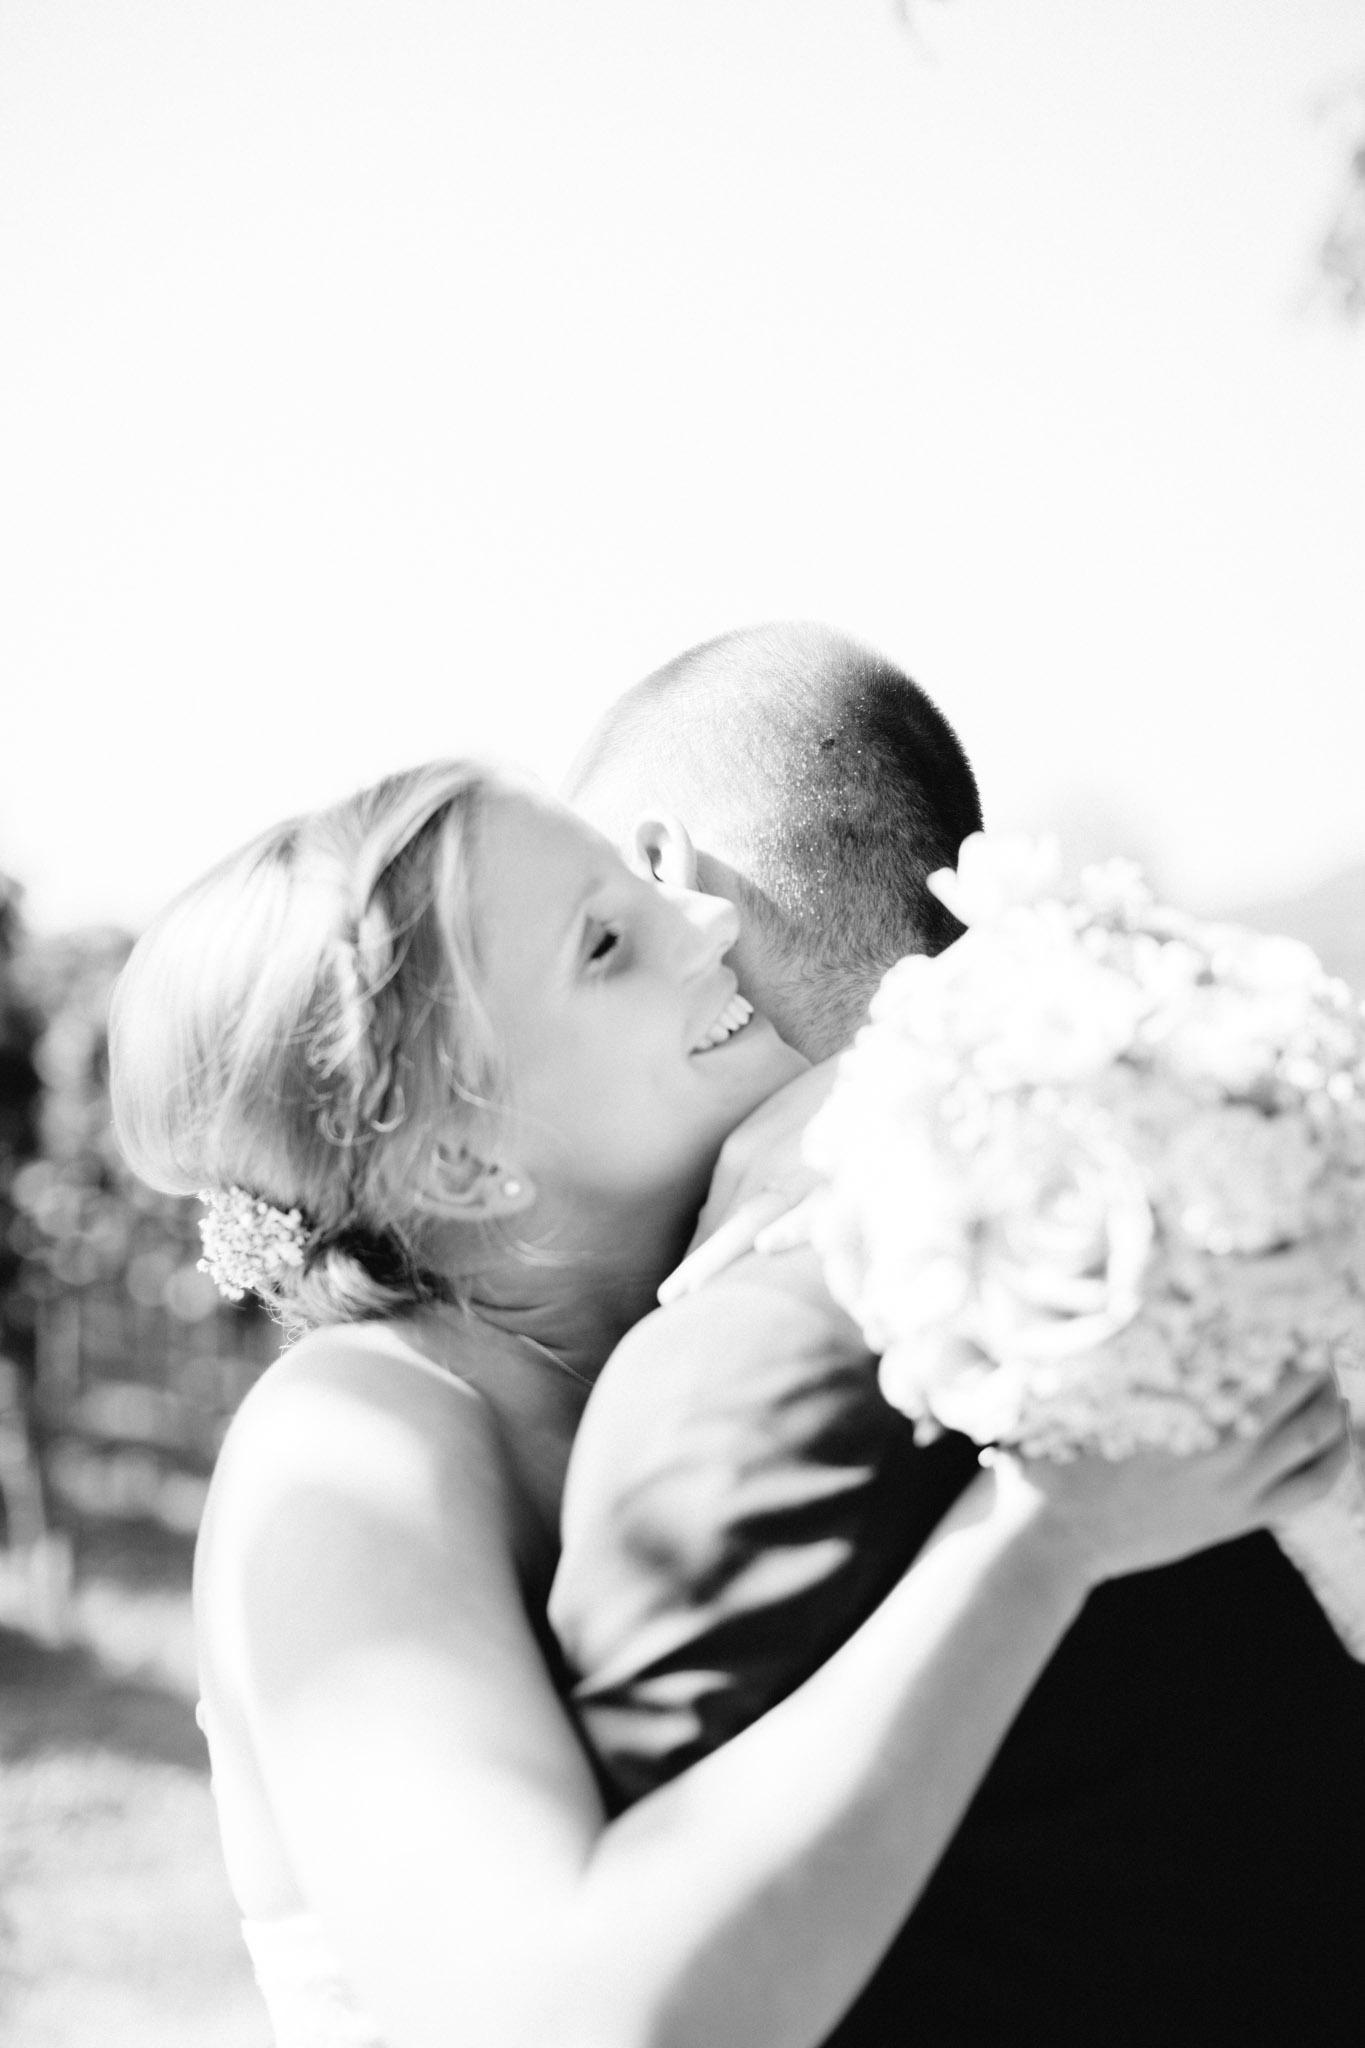 Lilienhof-Freiburg-Hochzeit-Pia-Anna-Christian-Wedding-Photography-FS-26.jpg